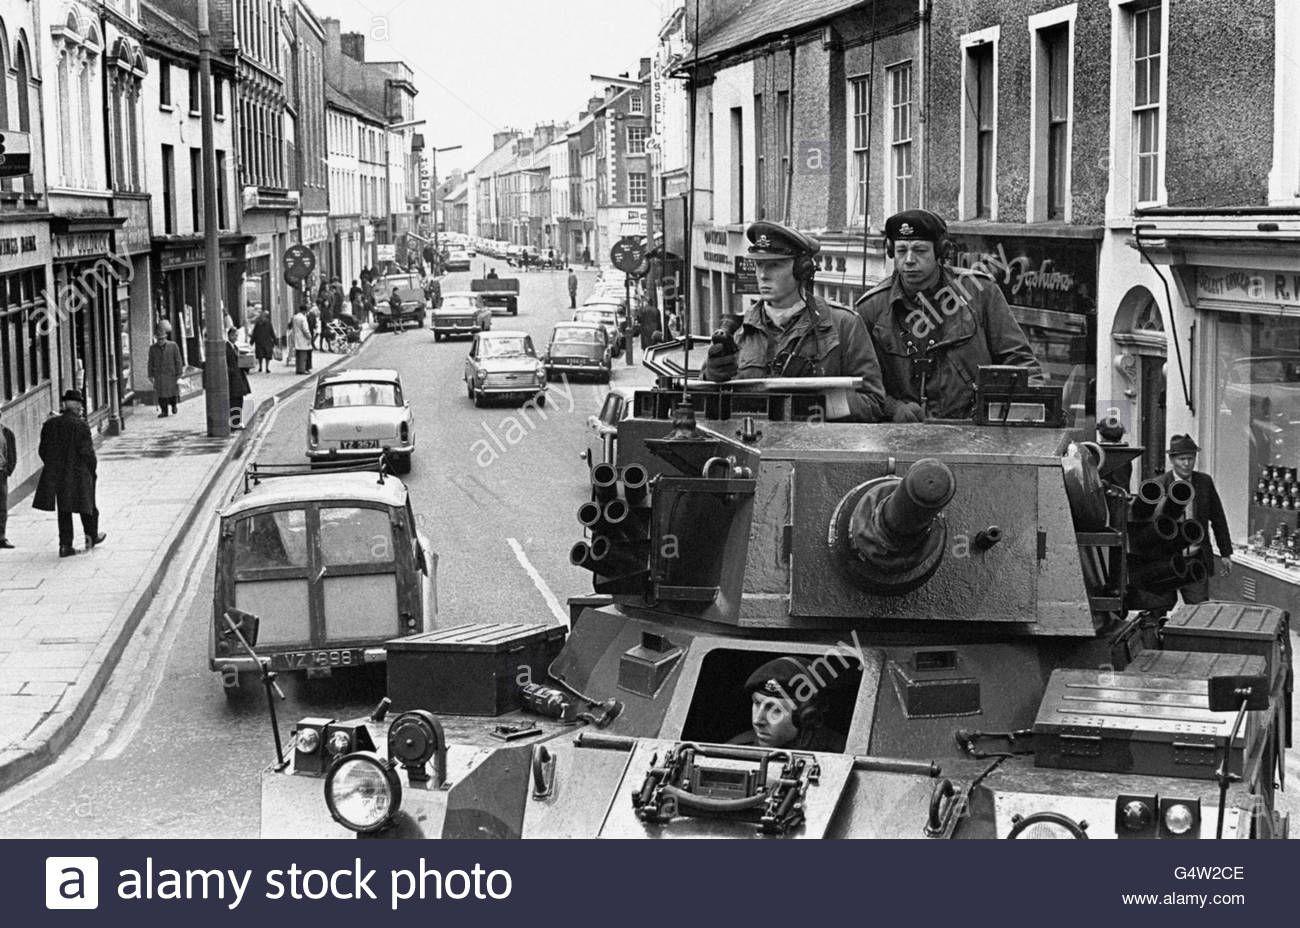 1ba2ff5e30 Military - Northern Ireland Troubles - Strabane